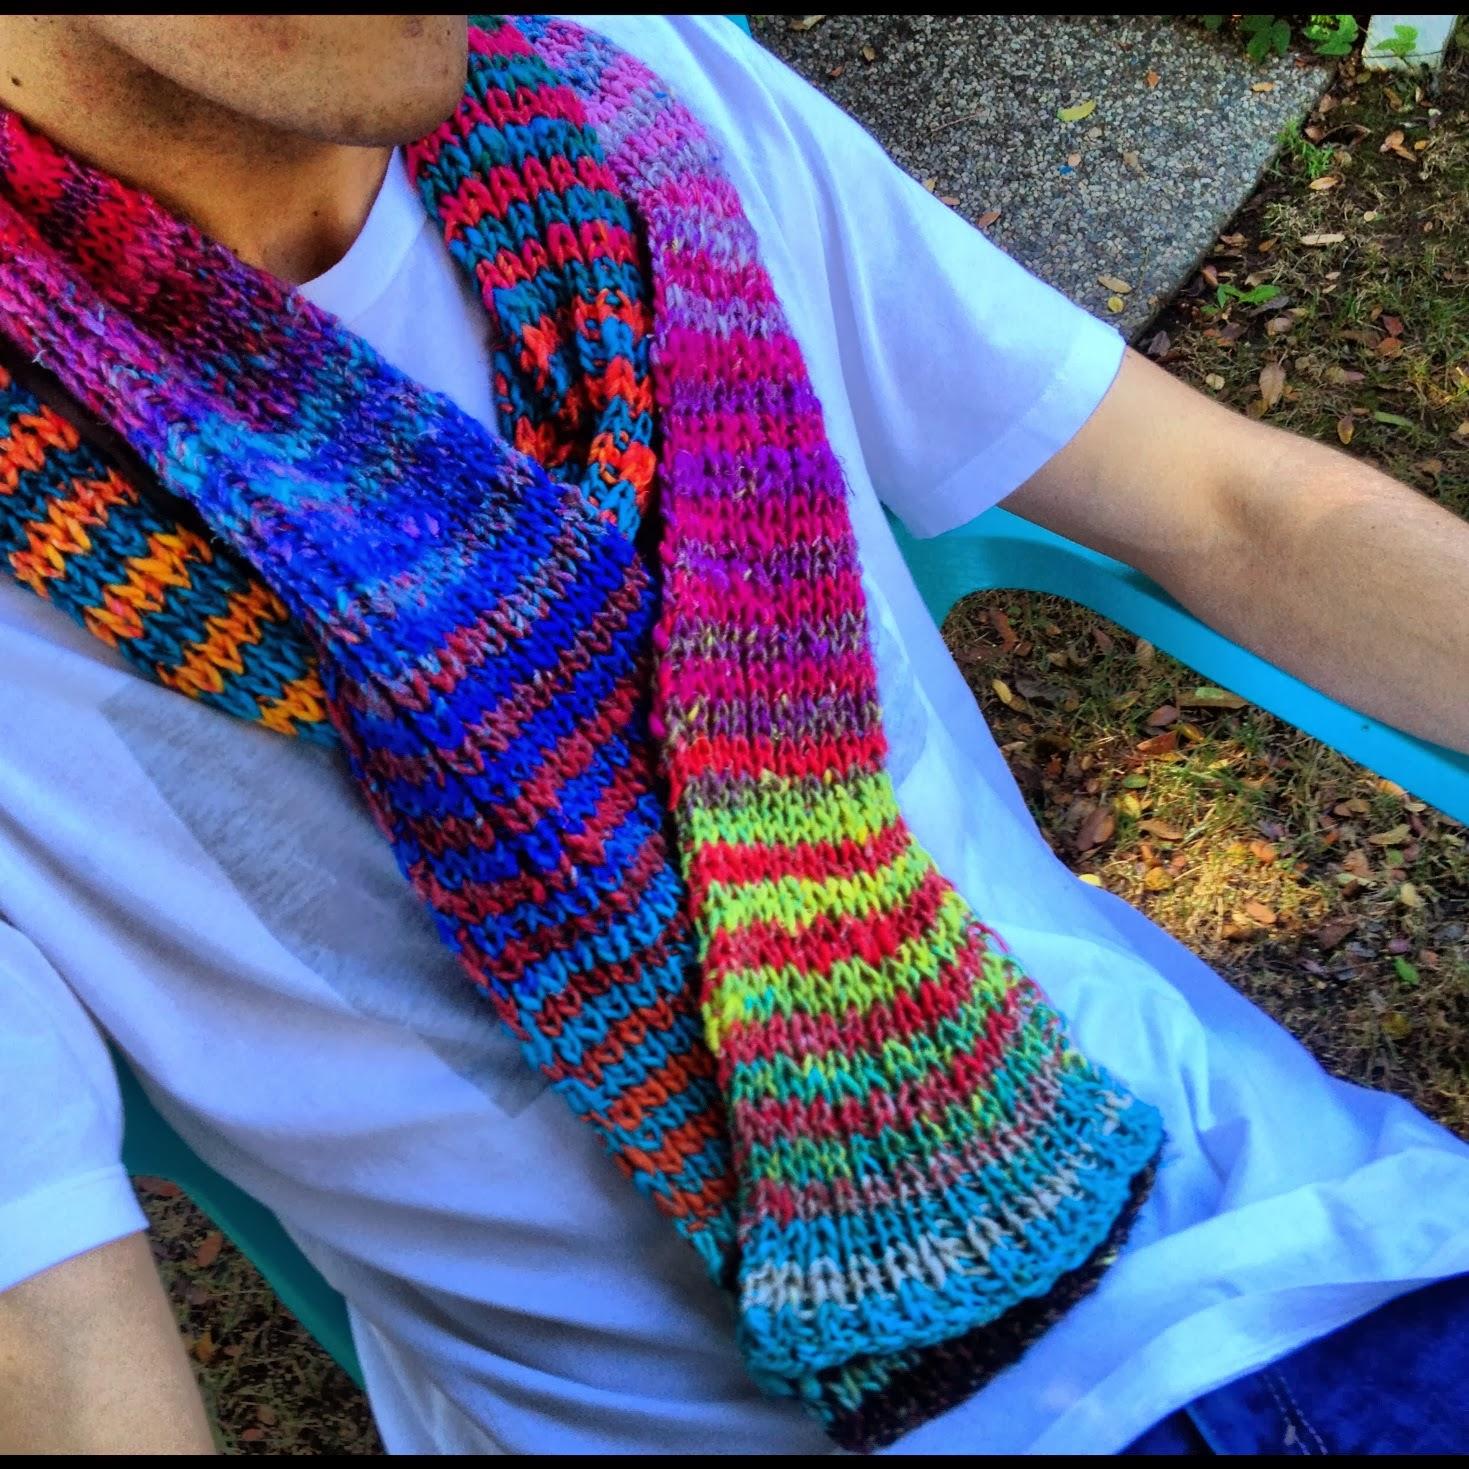 Knitting on fire: Handmade by Babette